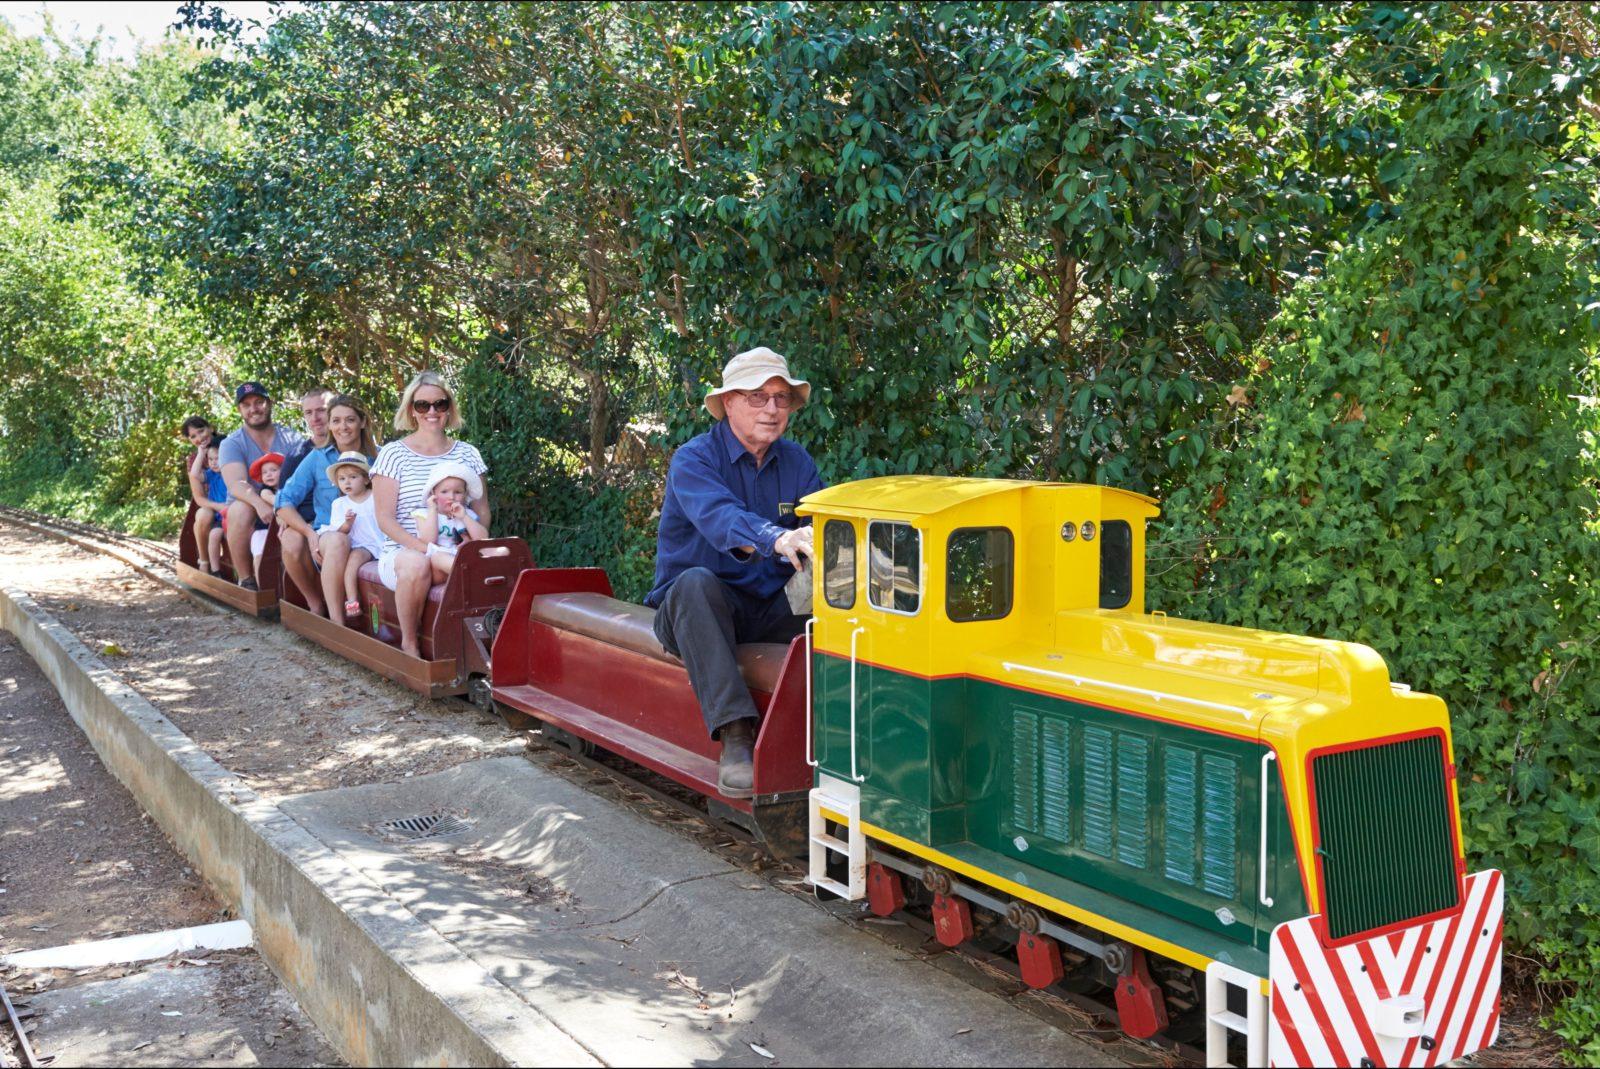 Willans Hill Miniature Railway, Wagga Wagga